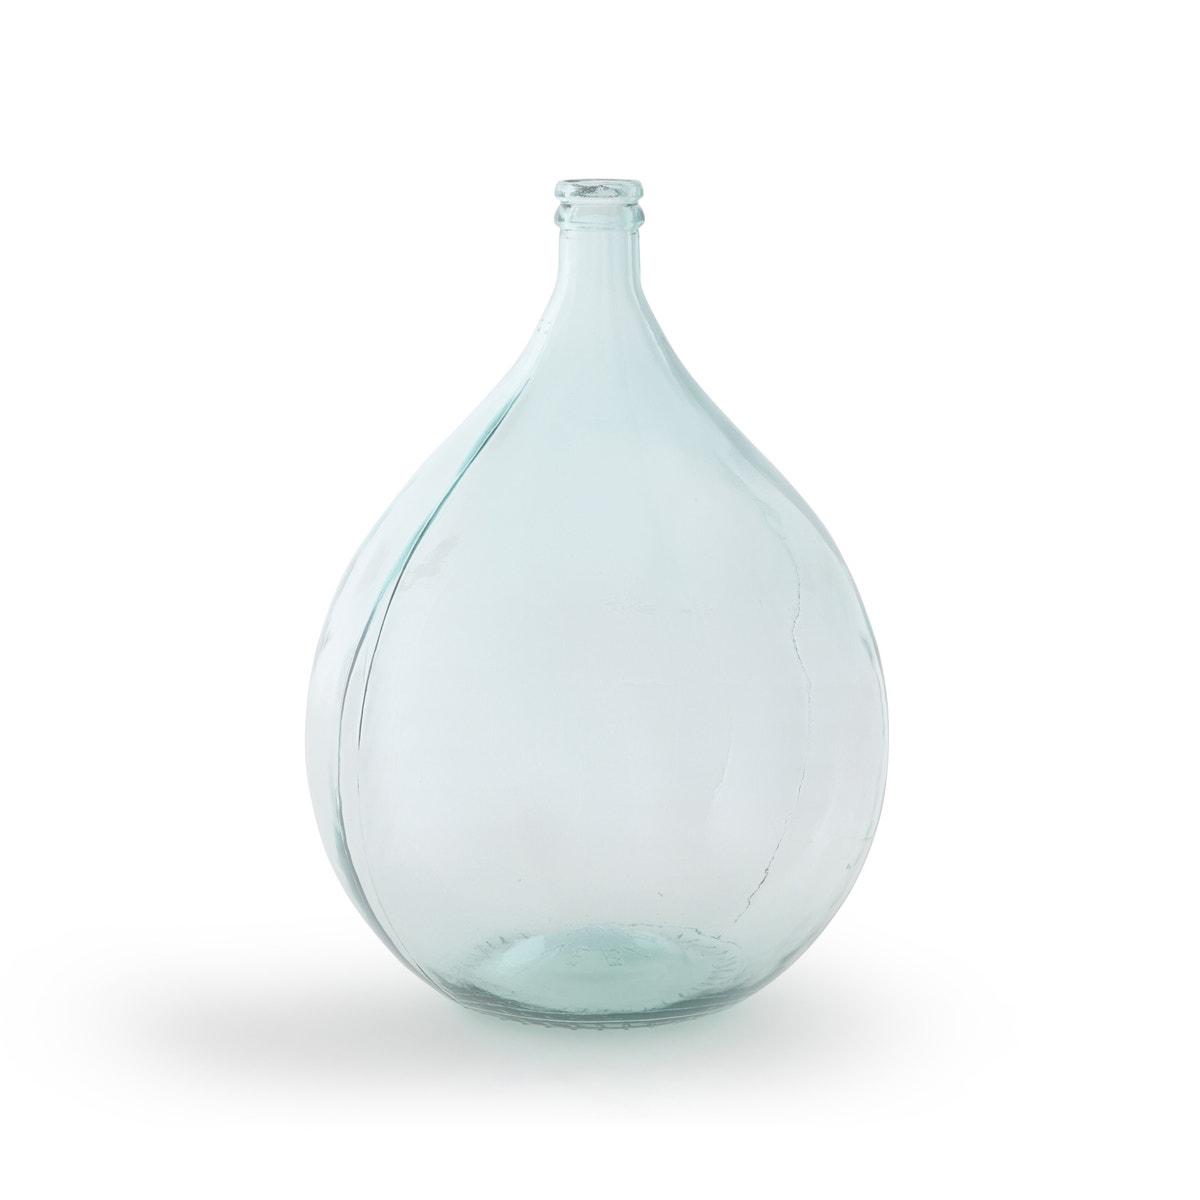 vaso-damigiana-vetro